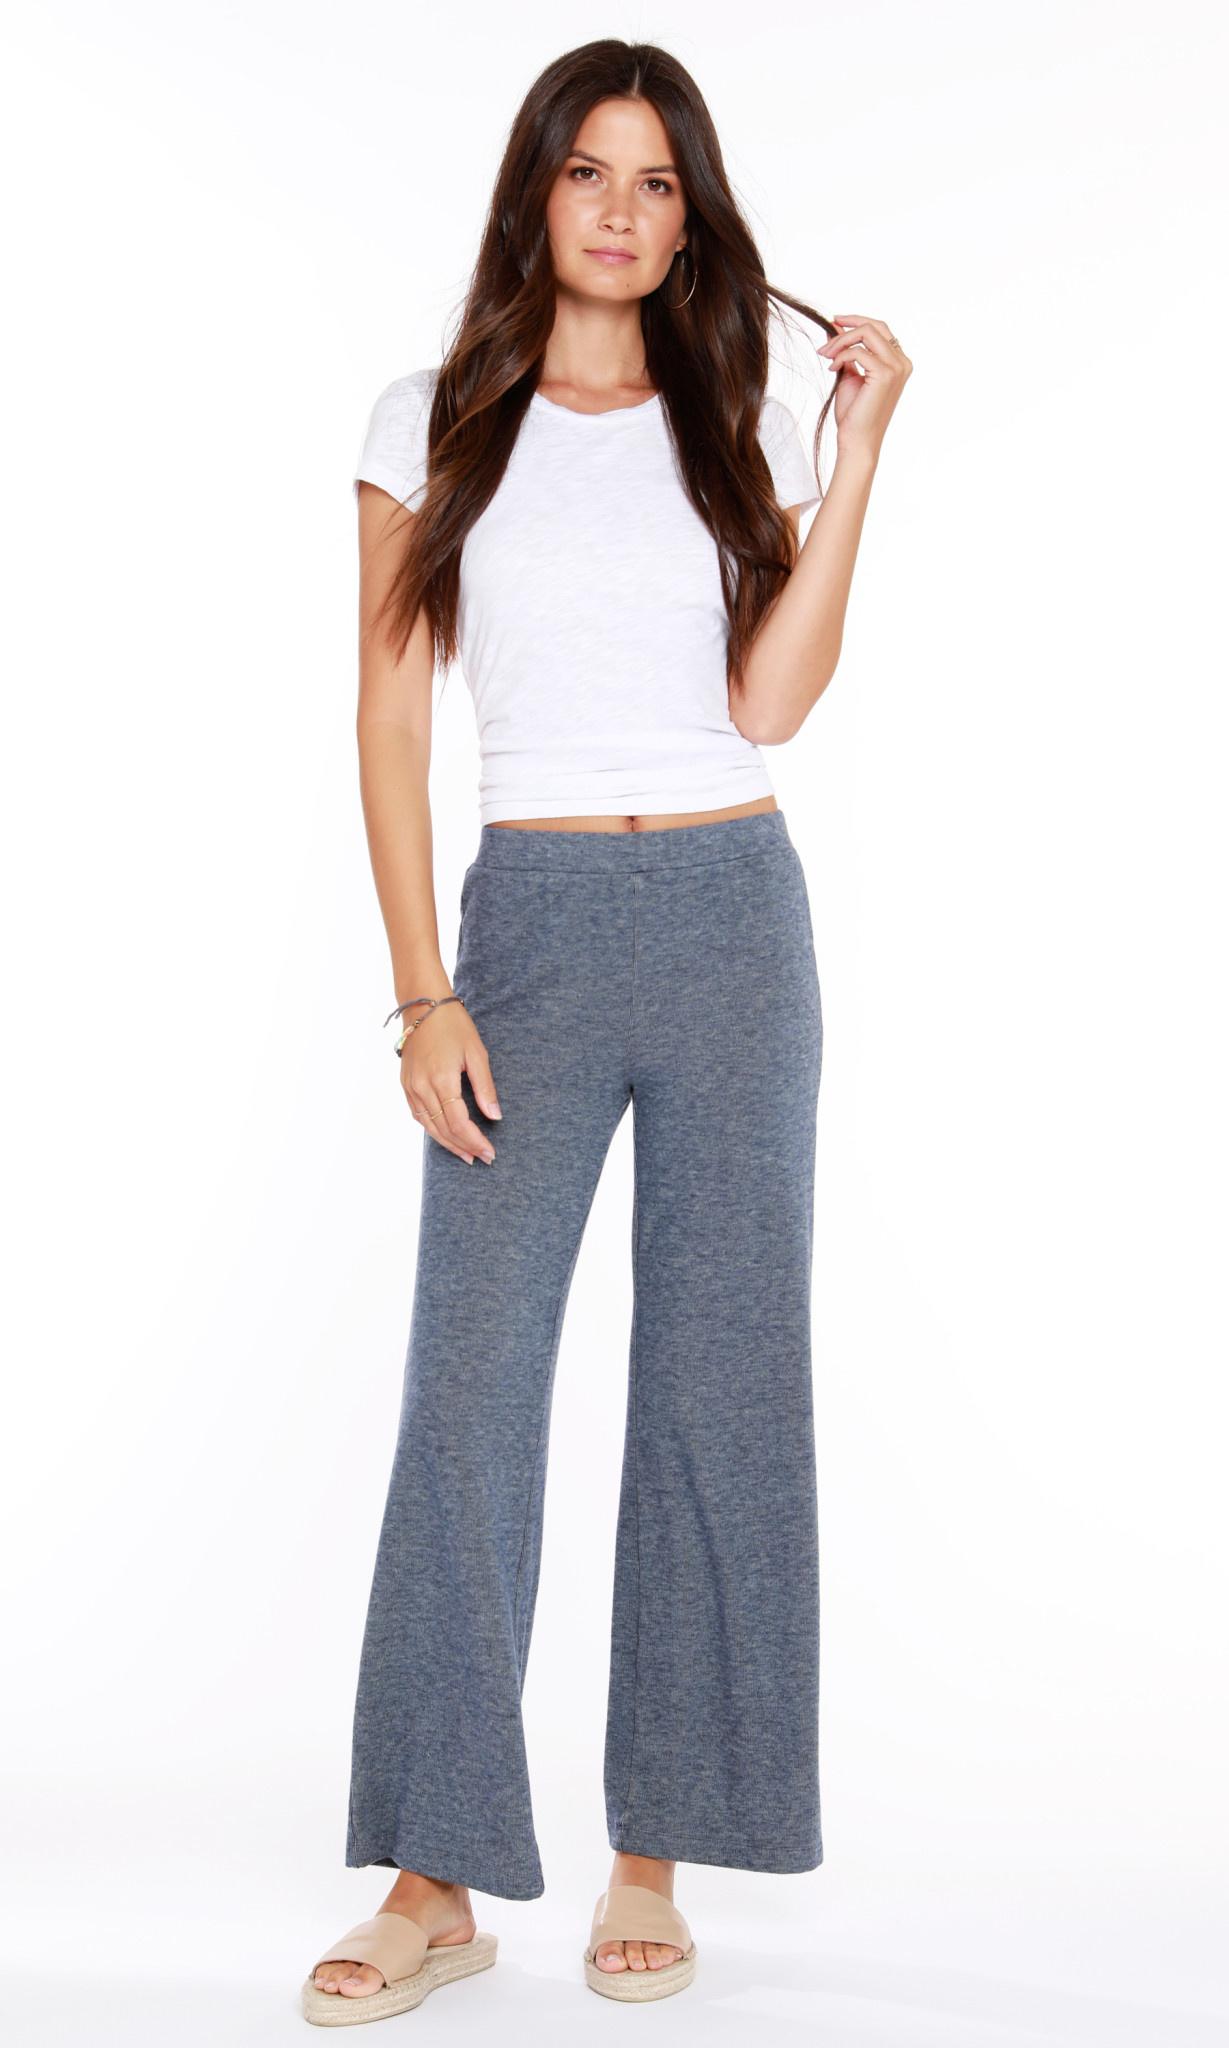 Cozy Heathered Knit Pants